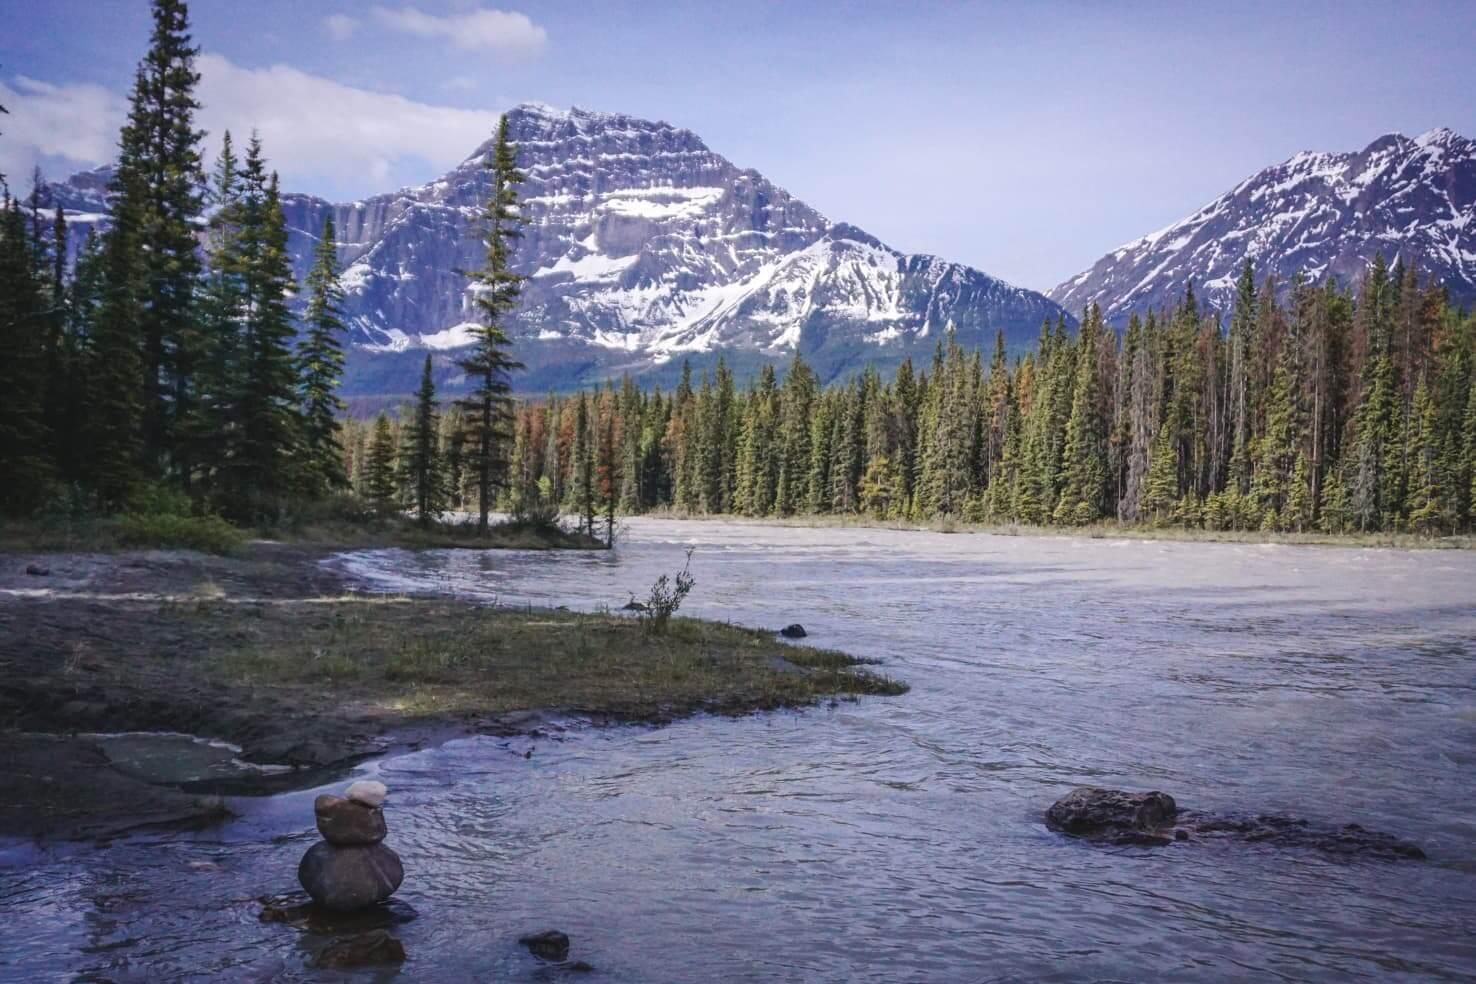 Camping in Jasper National Park - Kerkeslin Campground